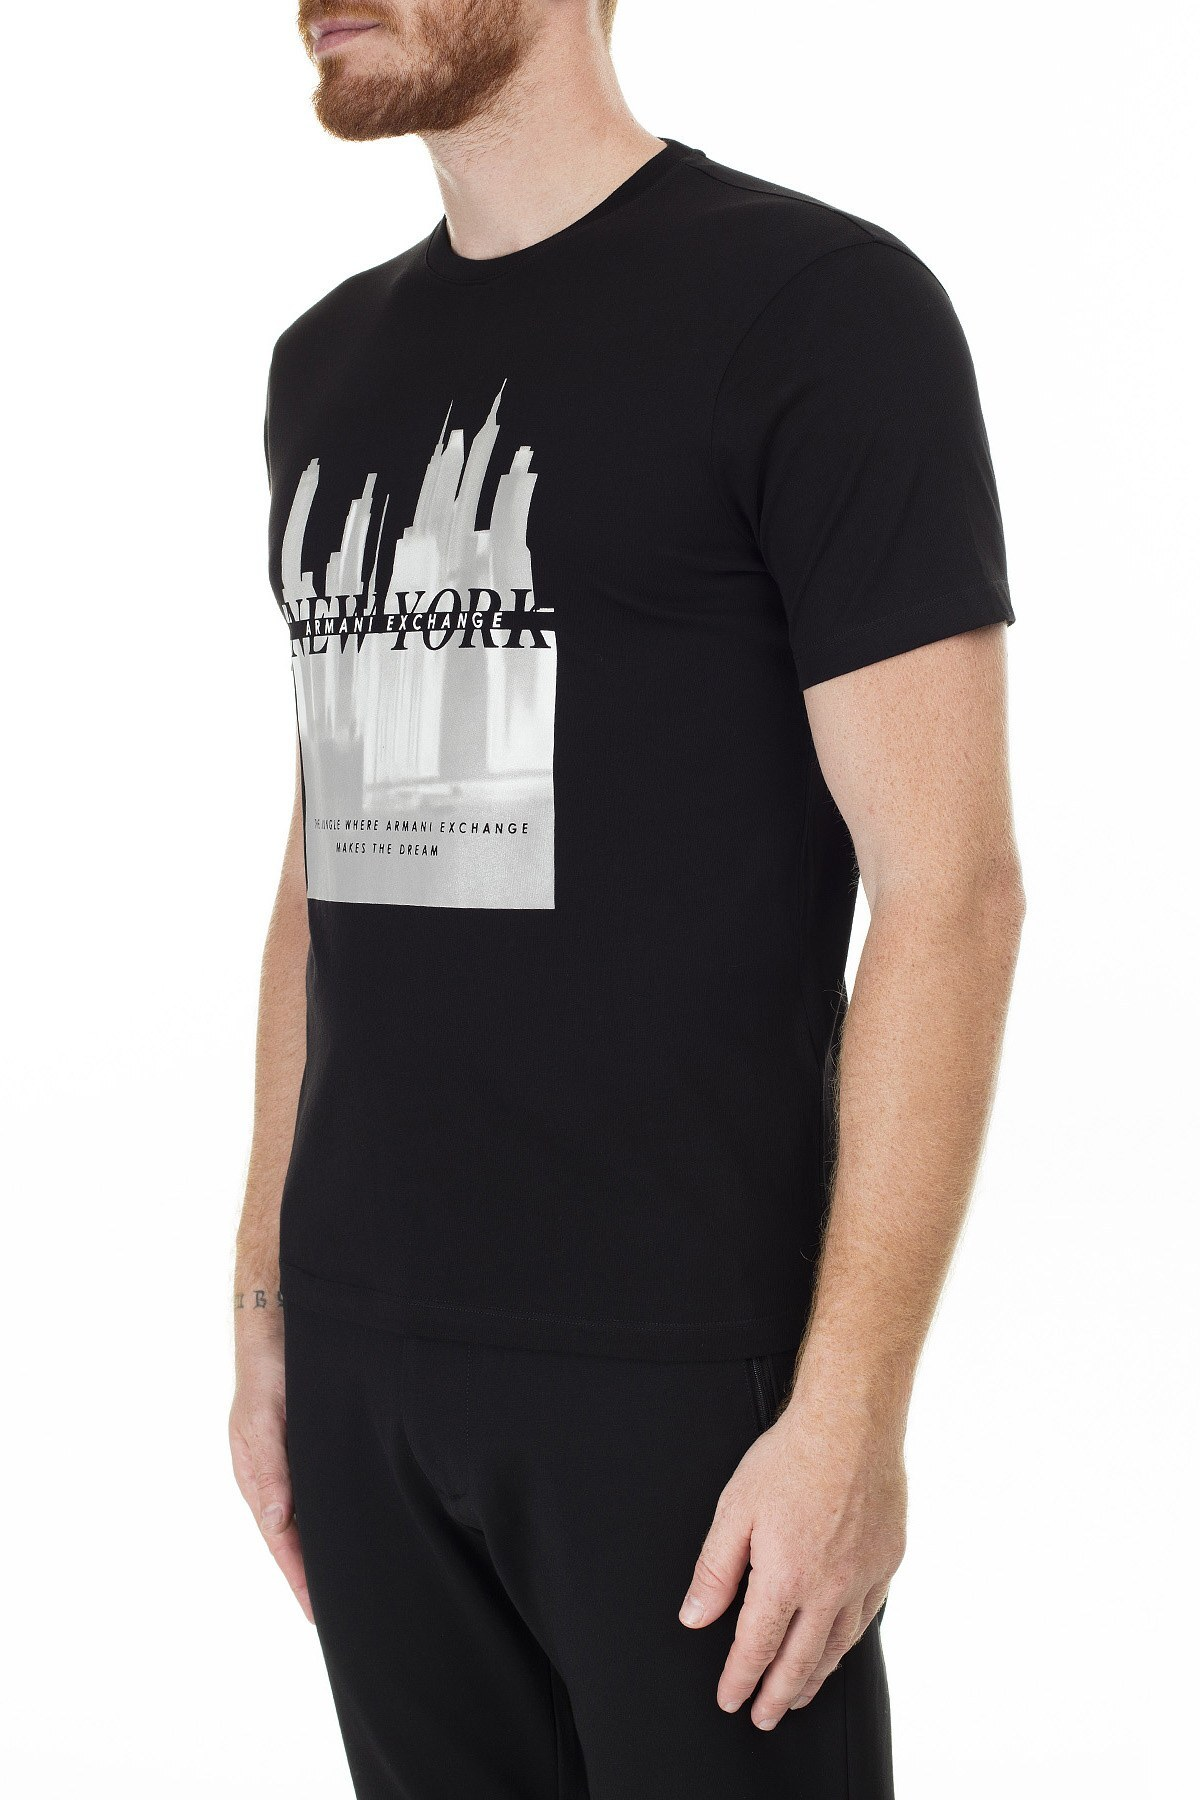 Armani Exchange Baskılı Bisiklet Yaka Erkek T Shirt 3HZTLM ZJH4Z 1200 SİYAH